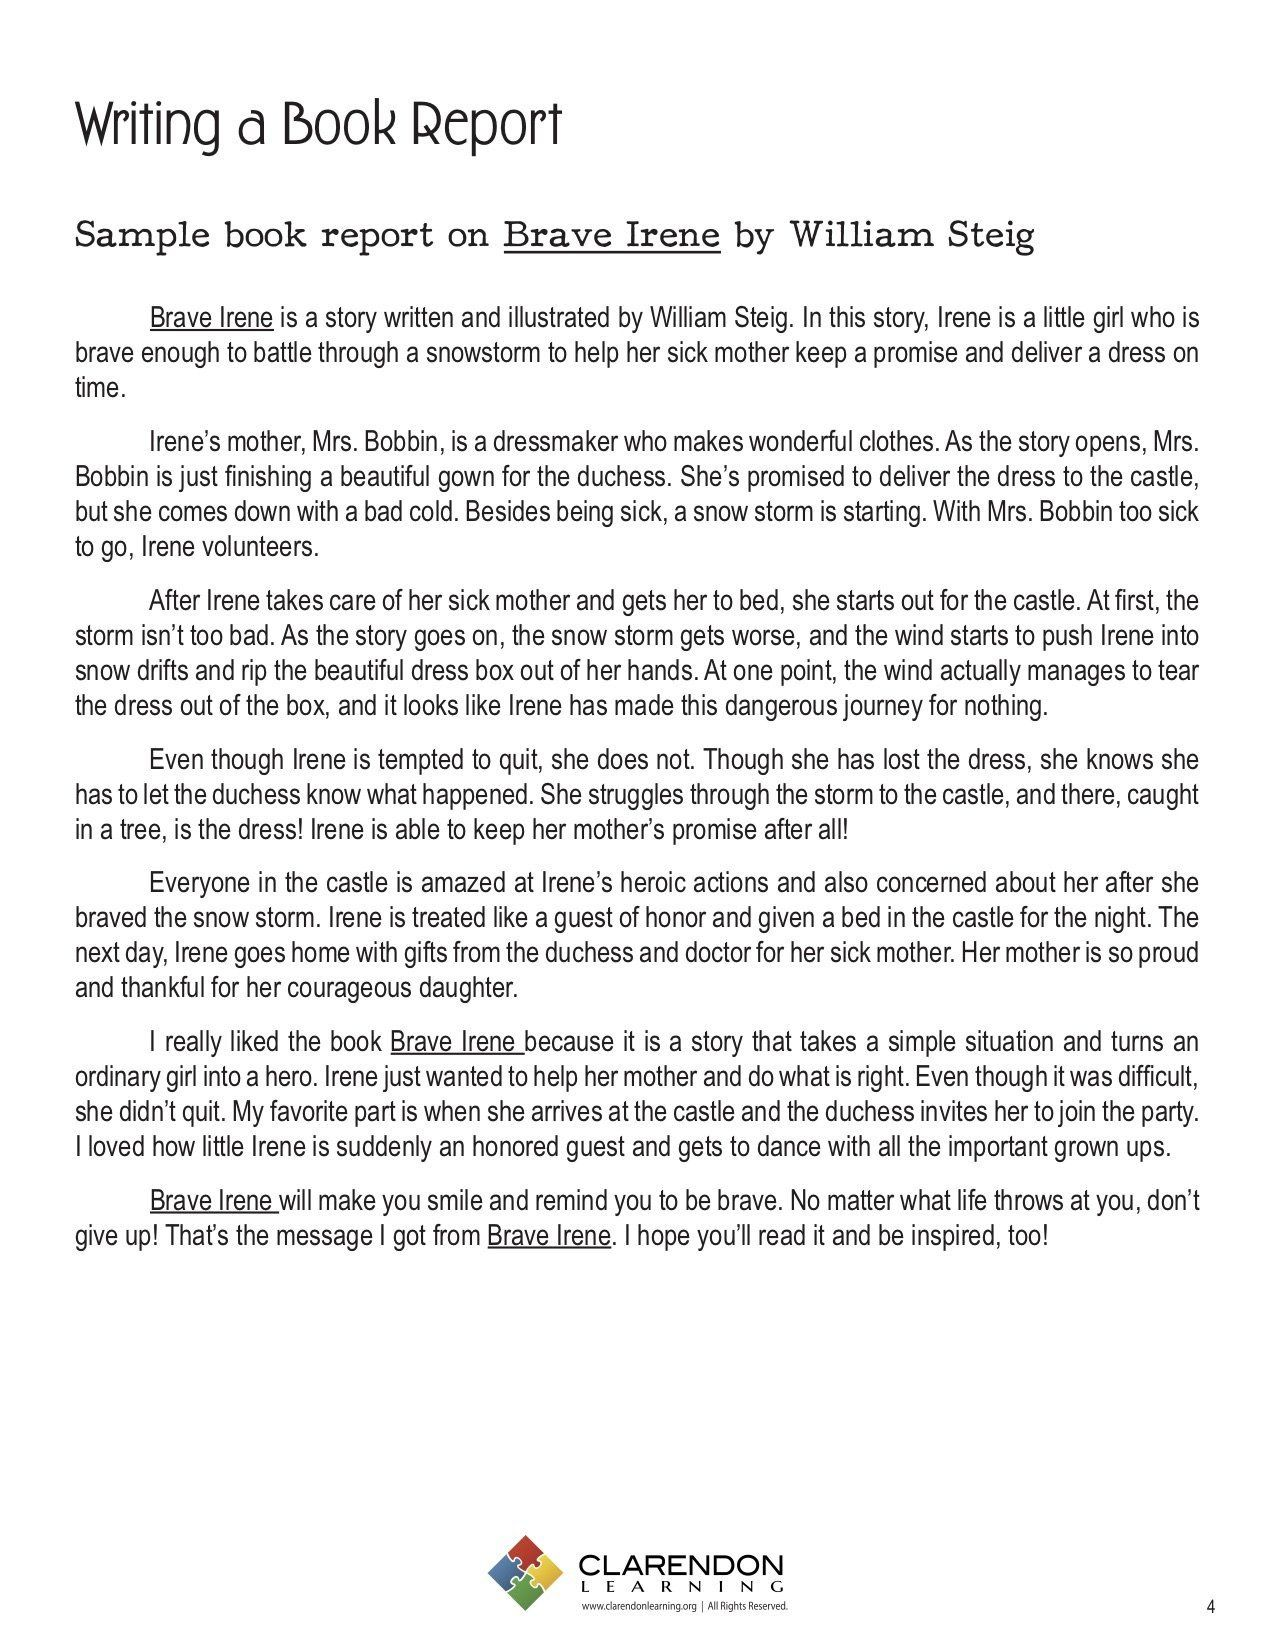 Sample Of Book Report Writing A Book Report In